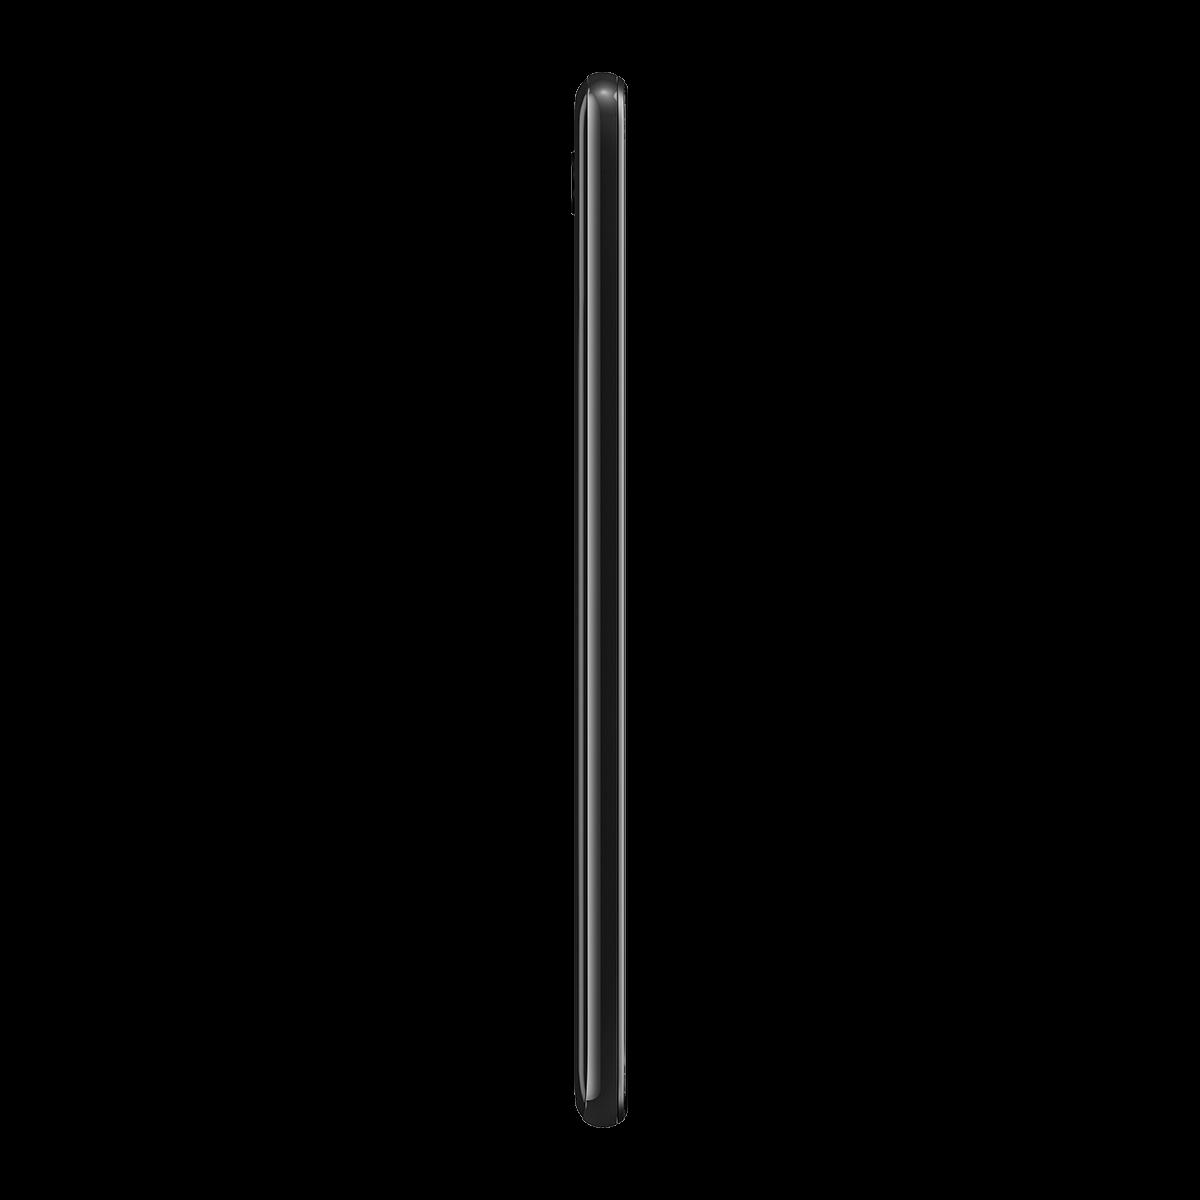 Google Pixel 3 XL | Mobile | Videotron